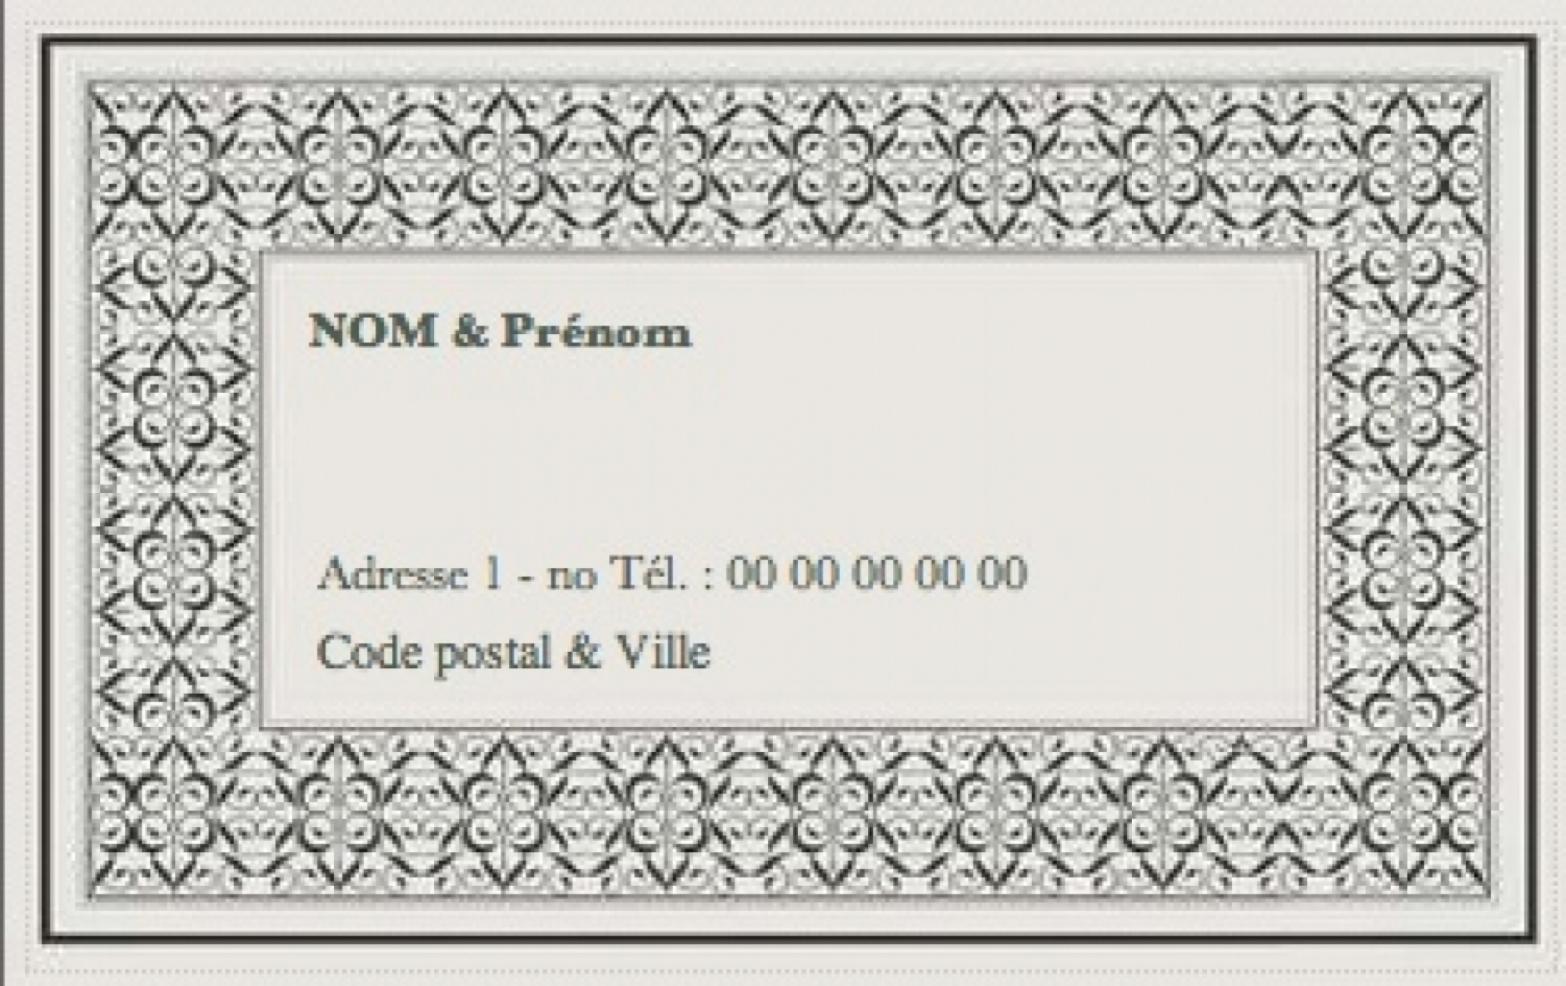 Carte de visite familiale grand format carte priv e cadre - Carte de visite gratuite sans frais de port ...